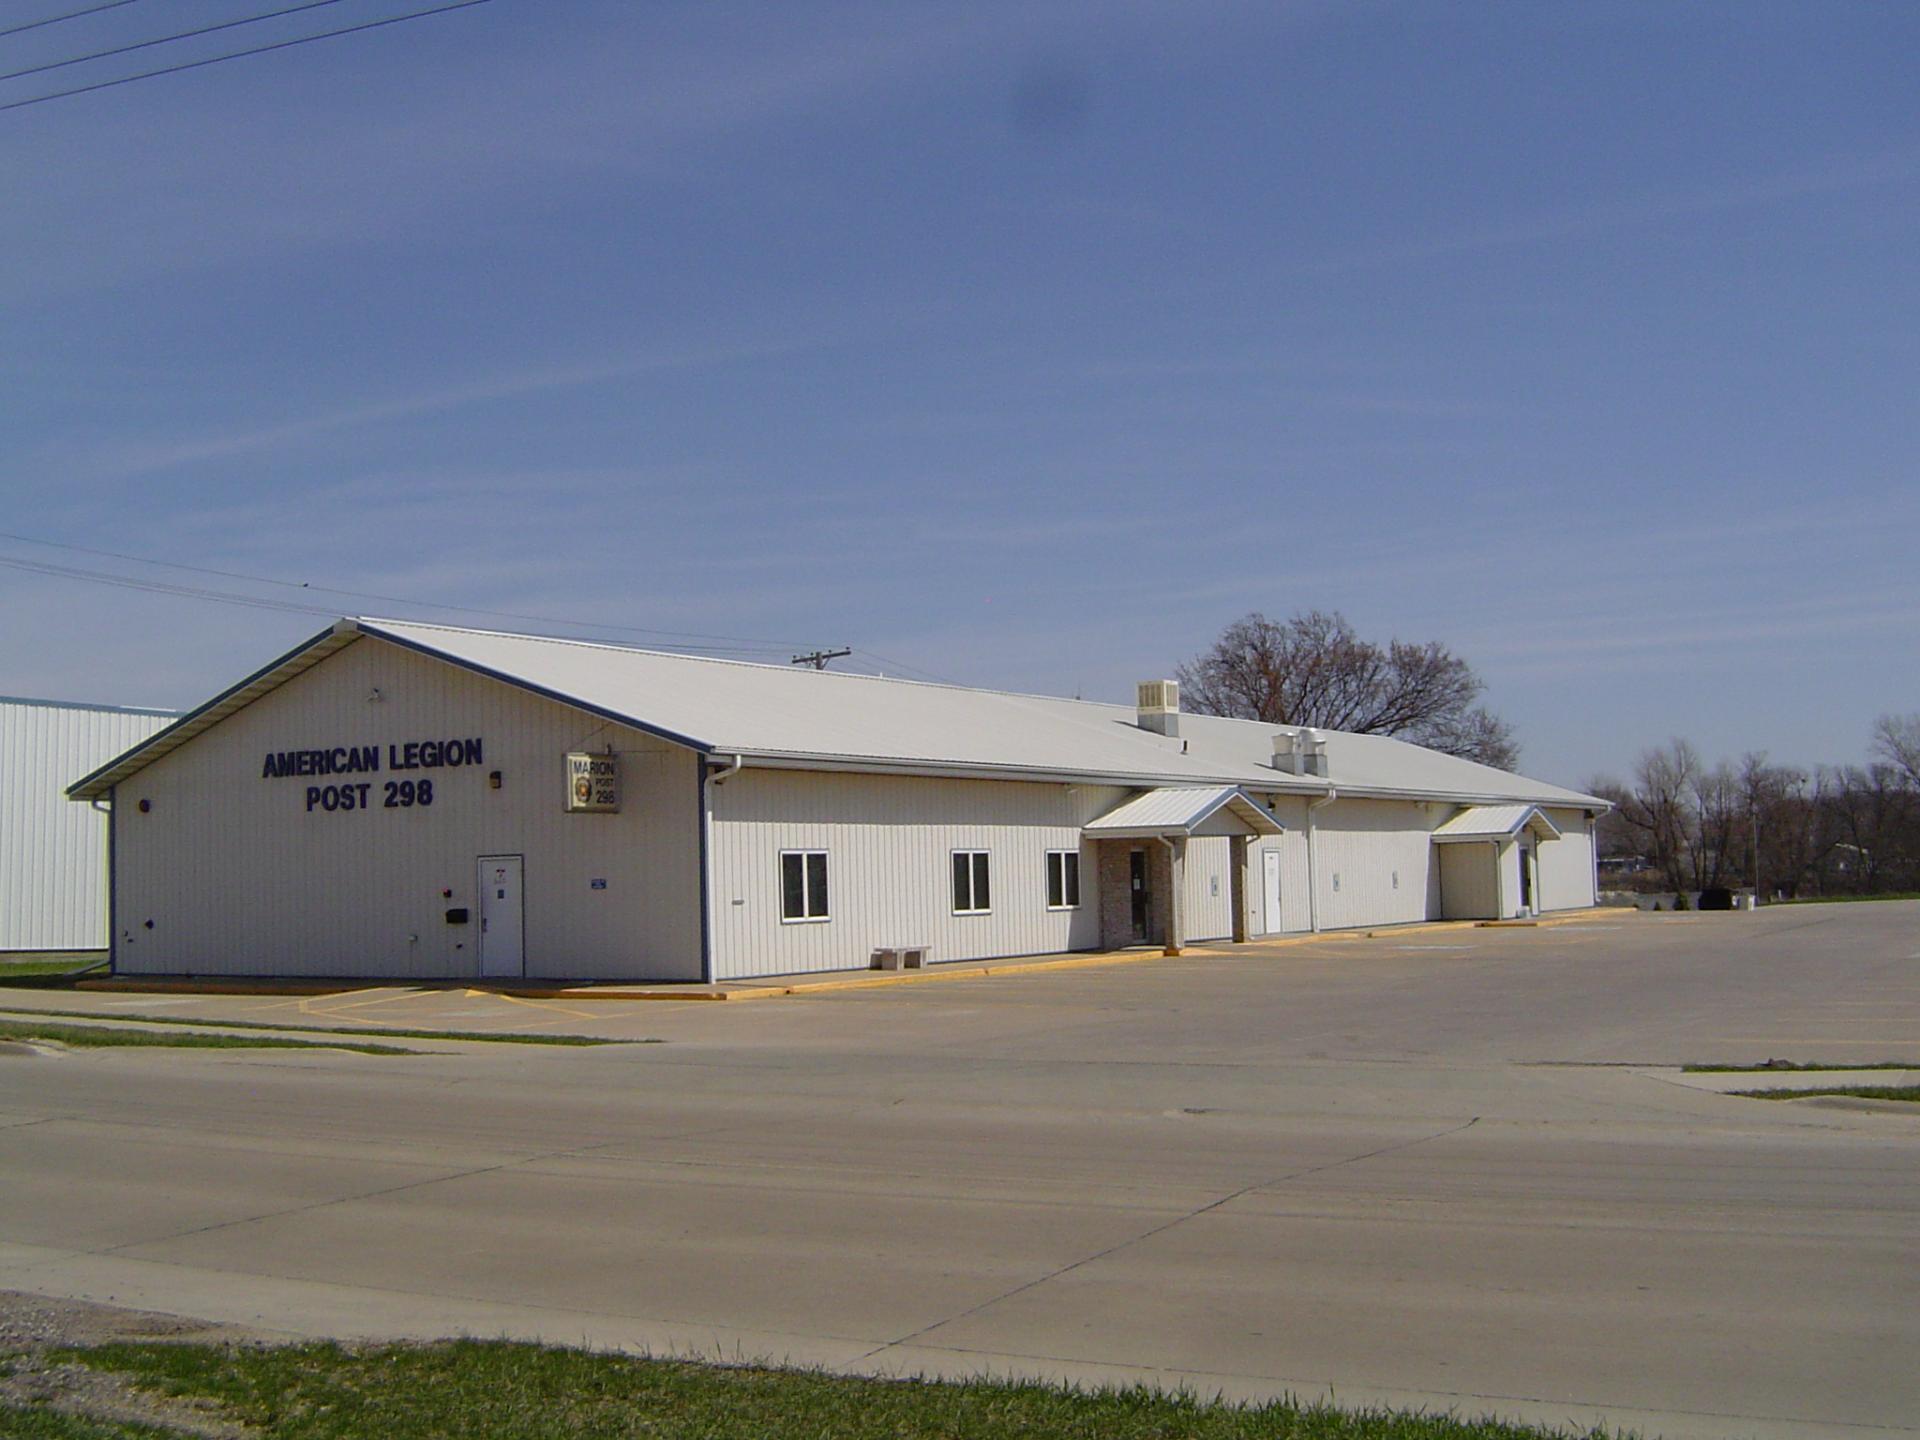 Post 298 Marion, Iowa